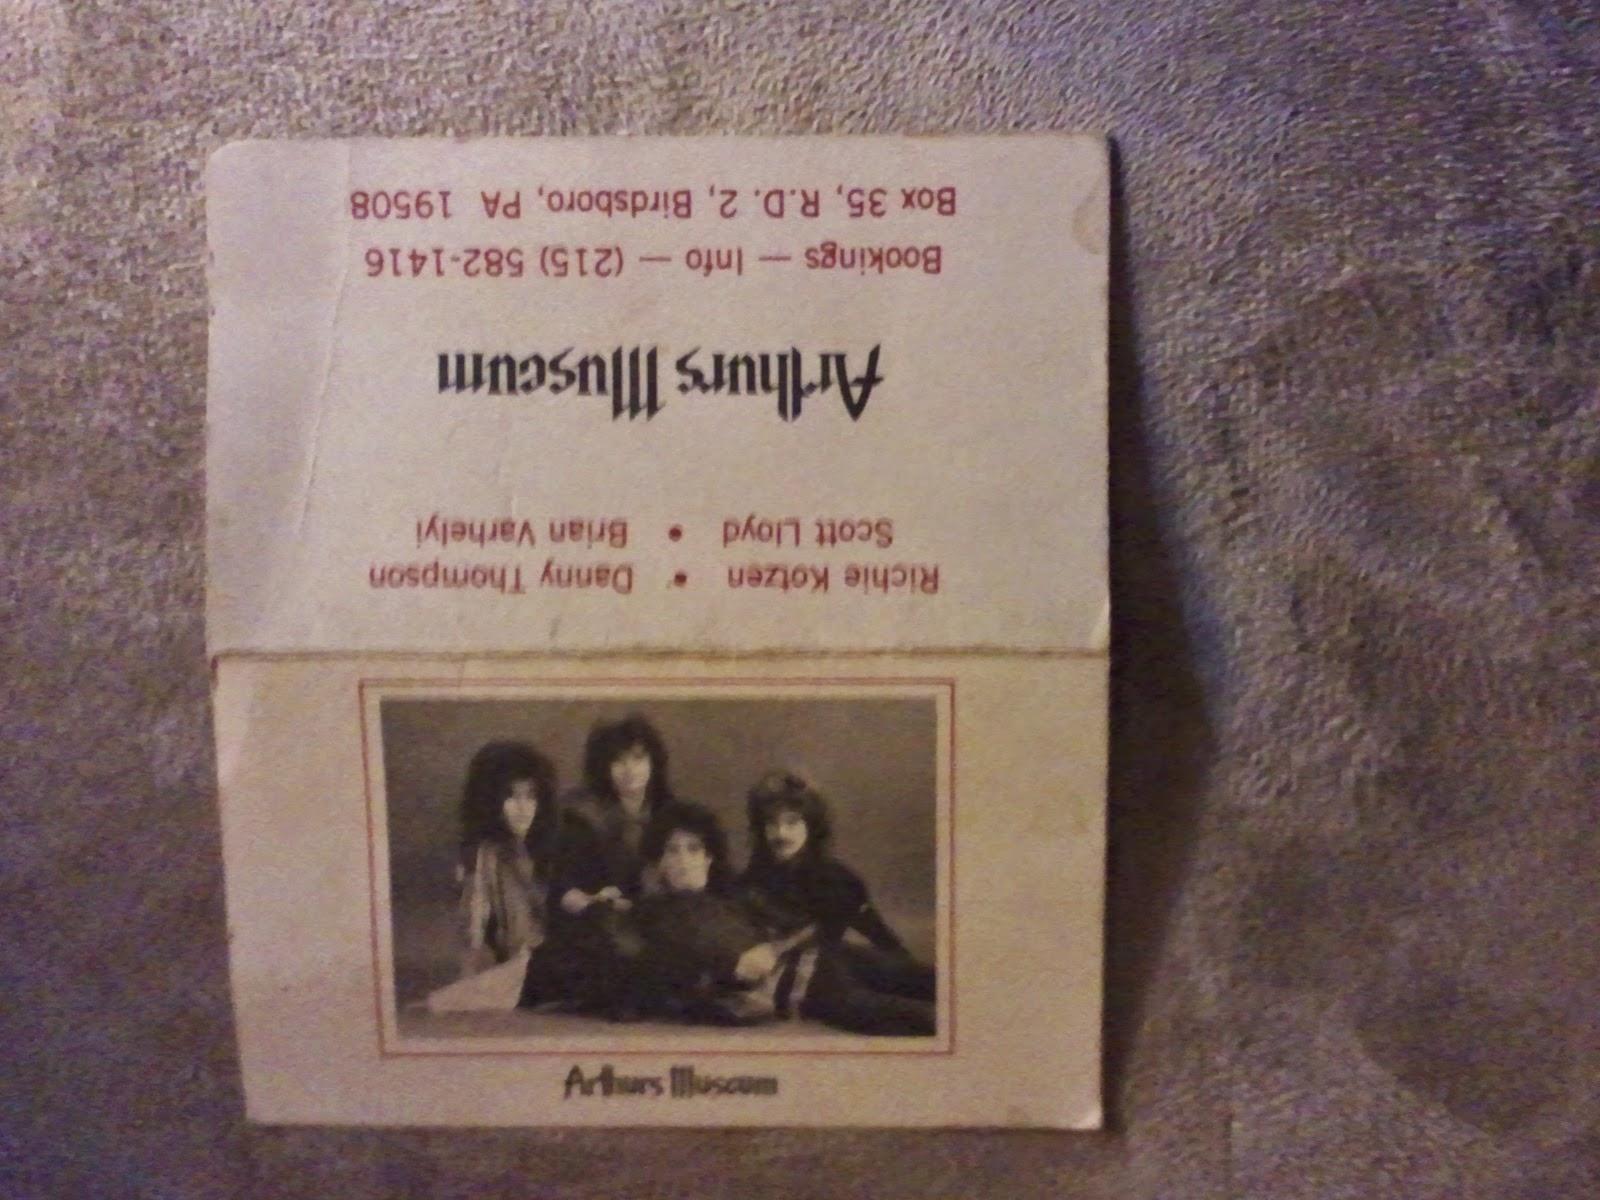 Arthurs Museum cassette